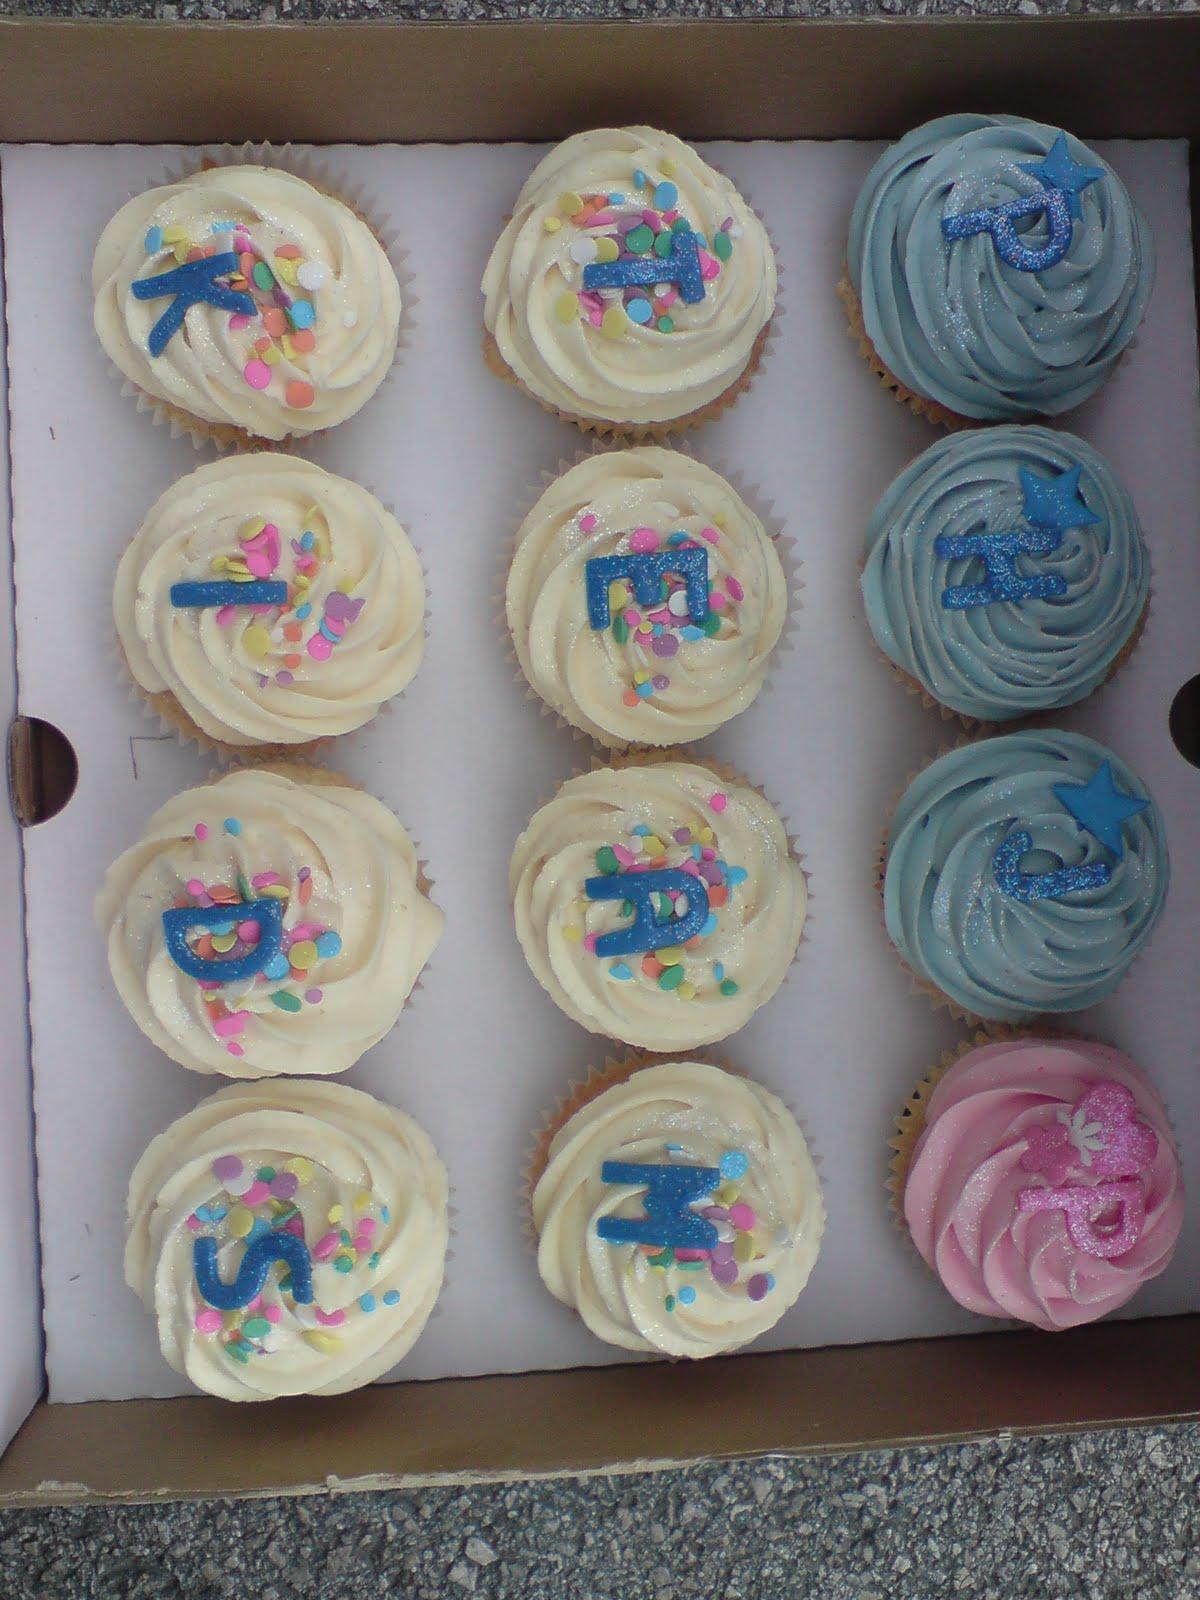 Cupcake Decorations Asda : Rubys Cupcakes: Peter Andre s cupcakes - Can Associates at ...